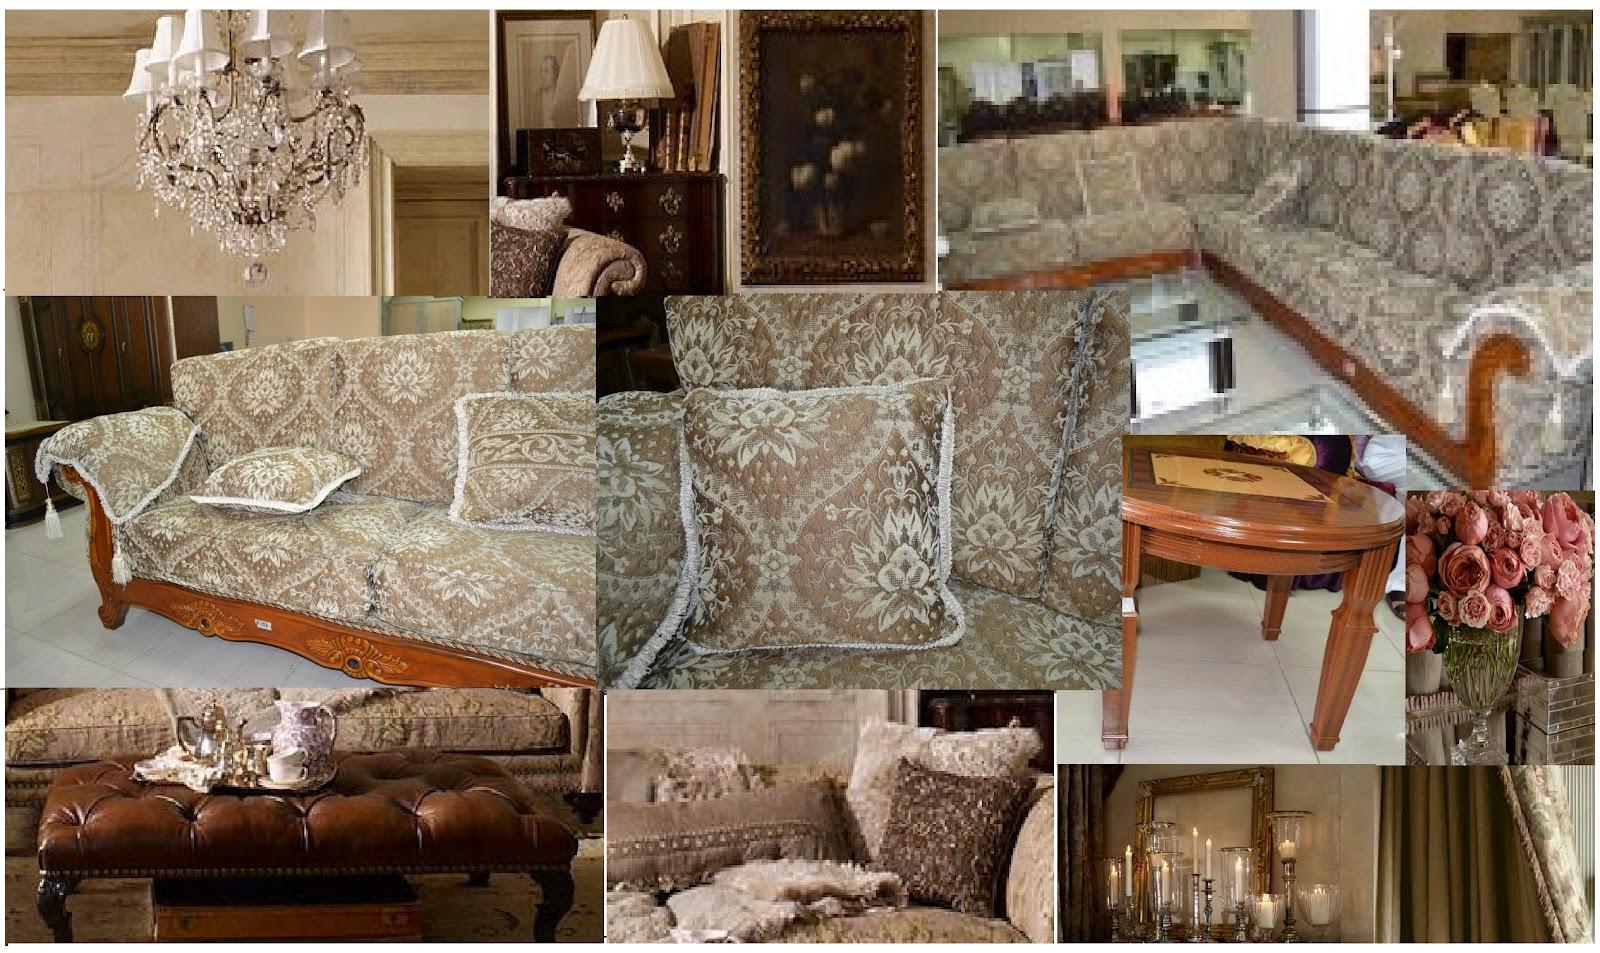 Brand New Arabic European Inspired Furniture Majlis Bedroom And